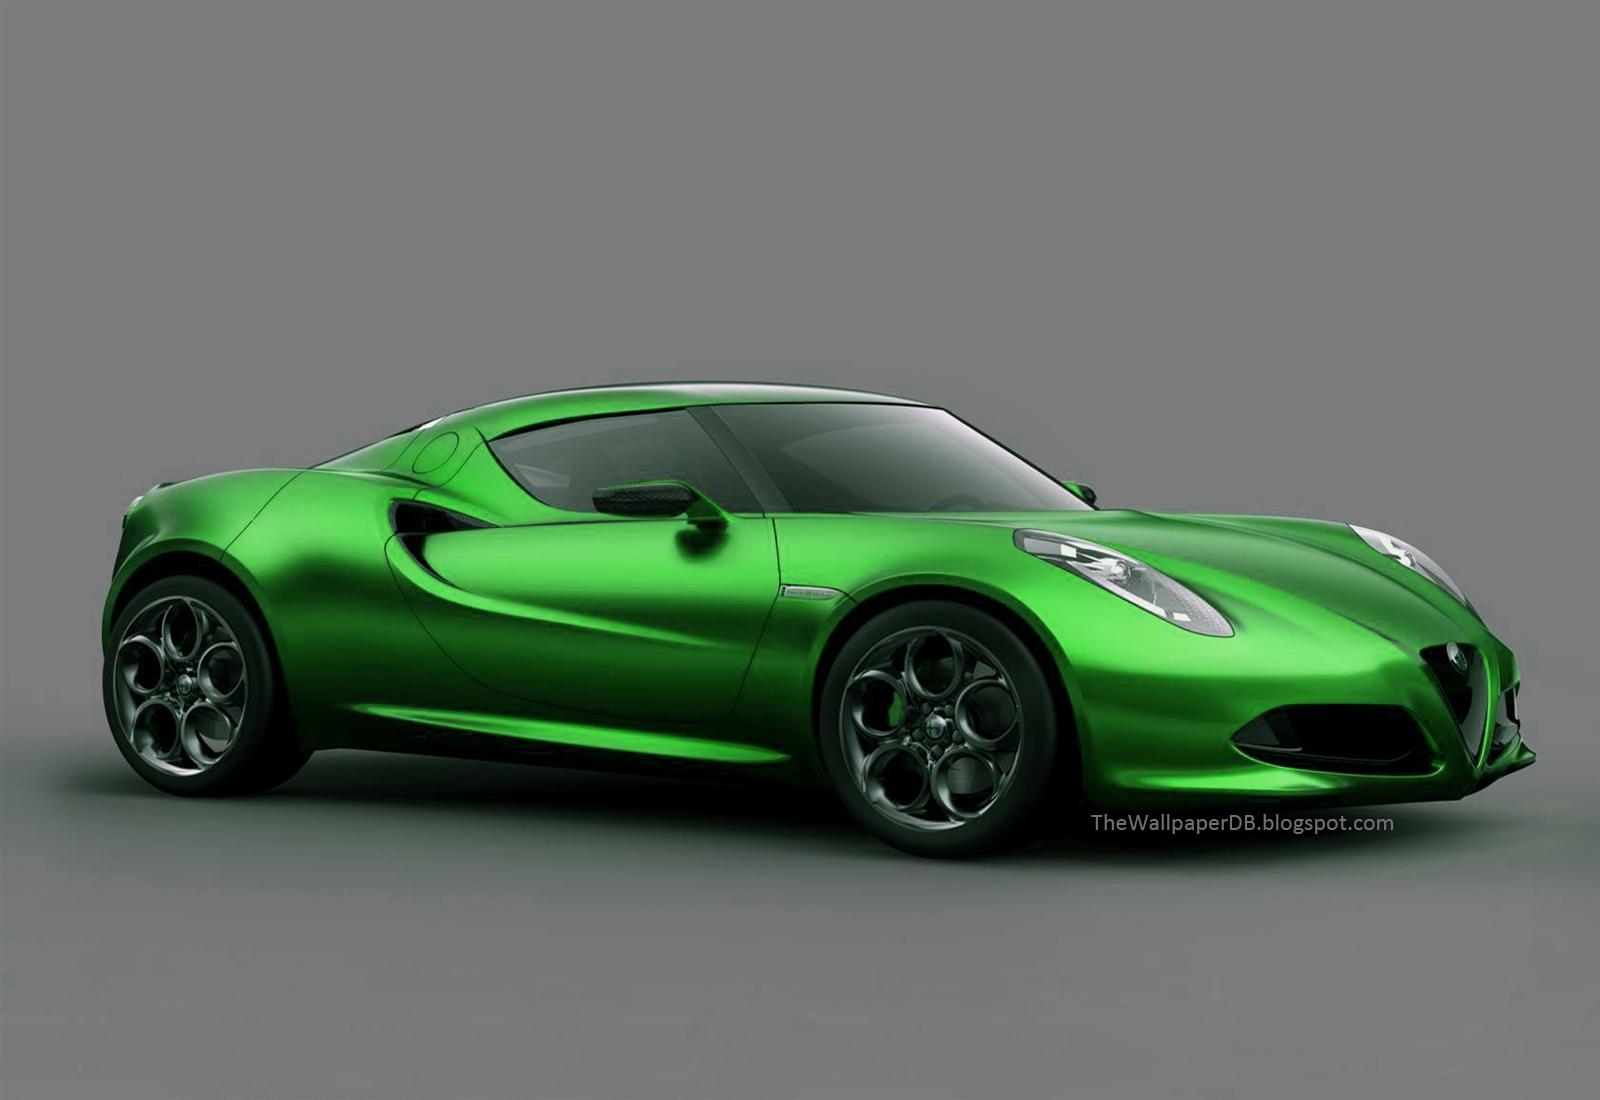 http://4.bp.blogspot.com/-4EERpVmTGM8/TjVWAUg-N4I/AAAAAAAAA5A/aPM154bgJnk/s1600/TheWallpaperDB.blogspot.com_+Alfa+Romeo+4C+Concept+%25281%2529.jpg